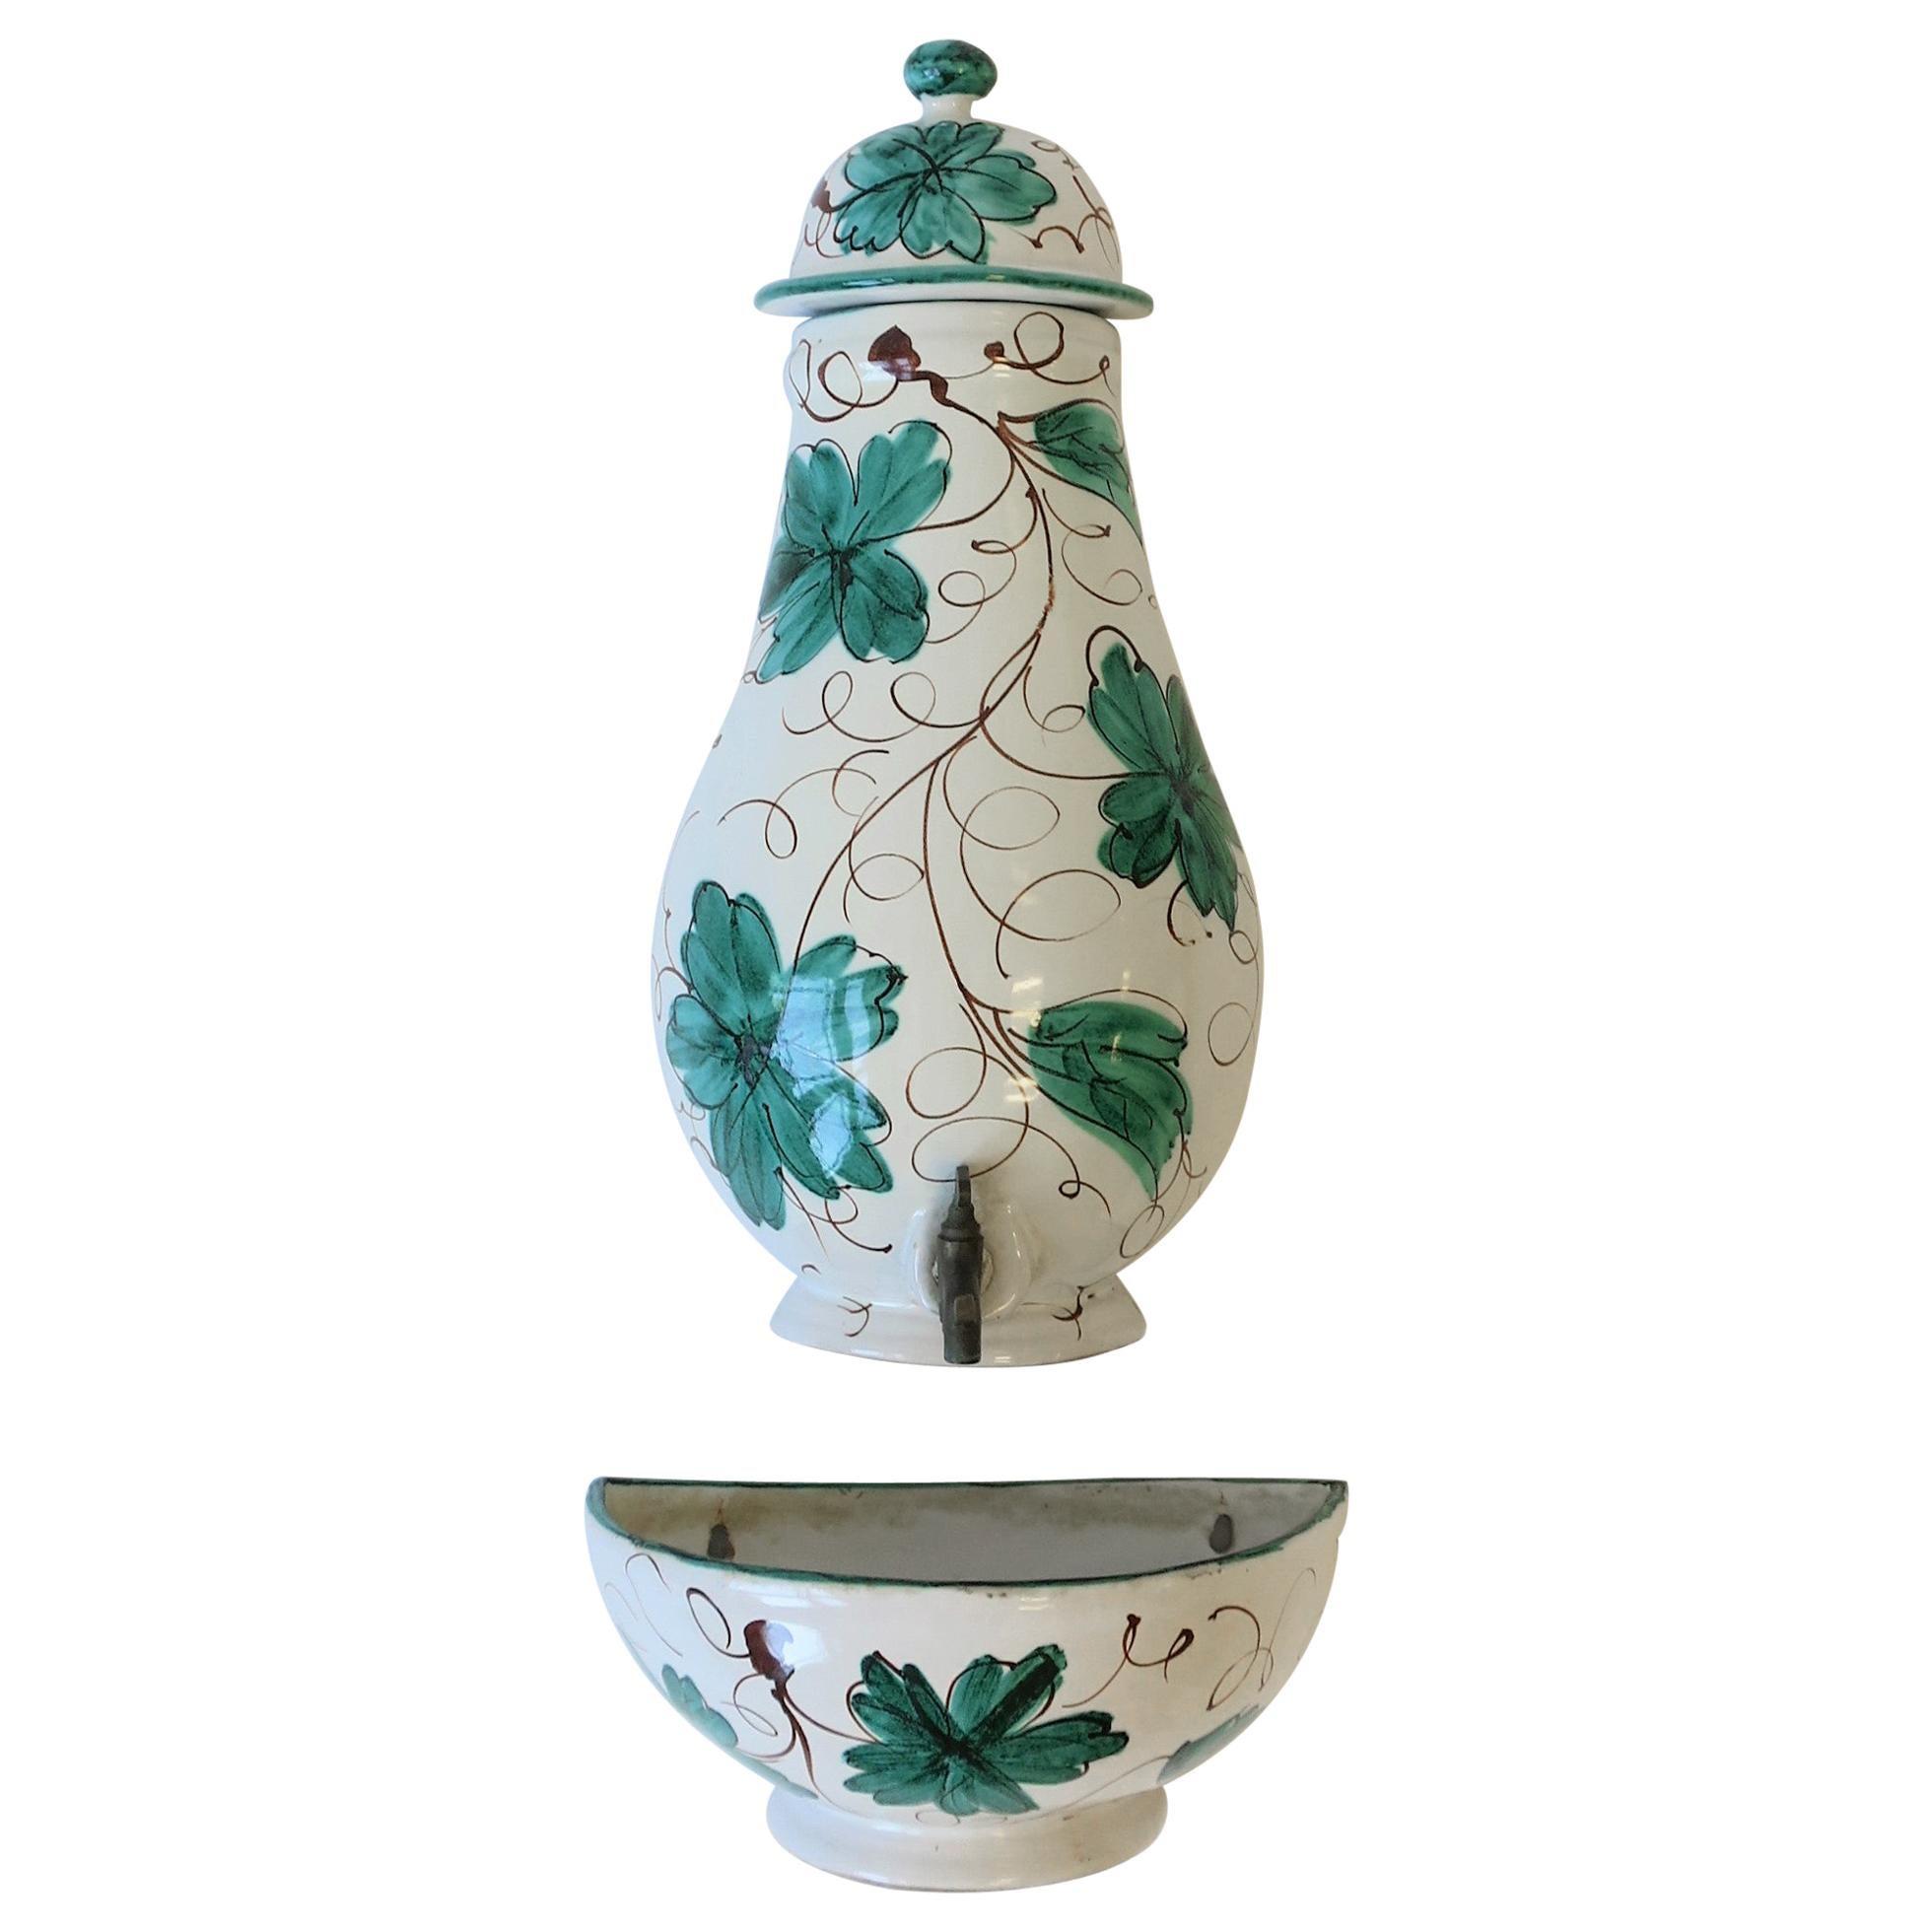 Italian Terracotta Ceramic Wall Fountain